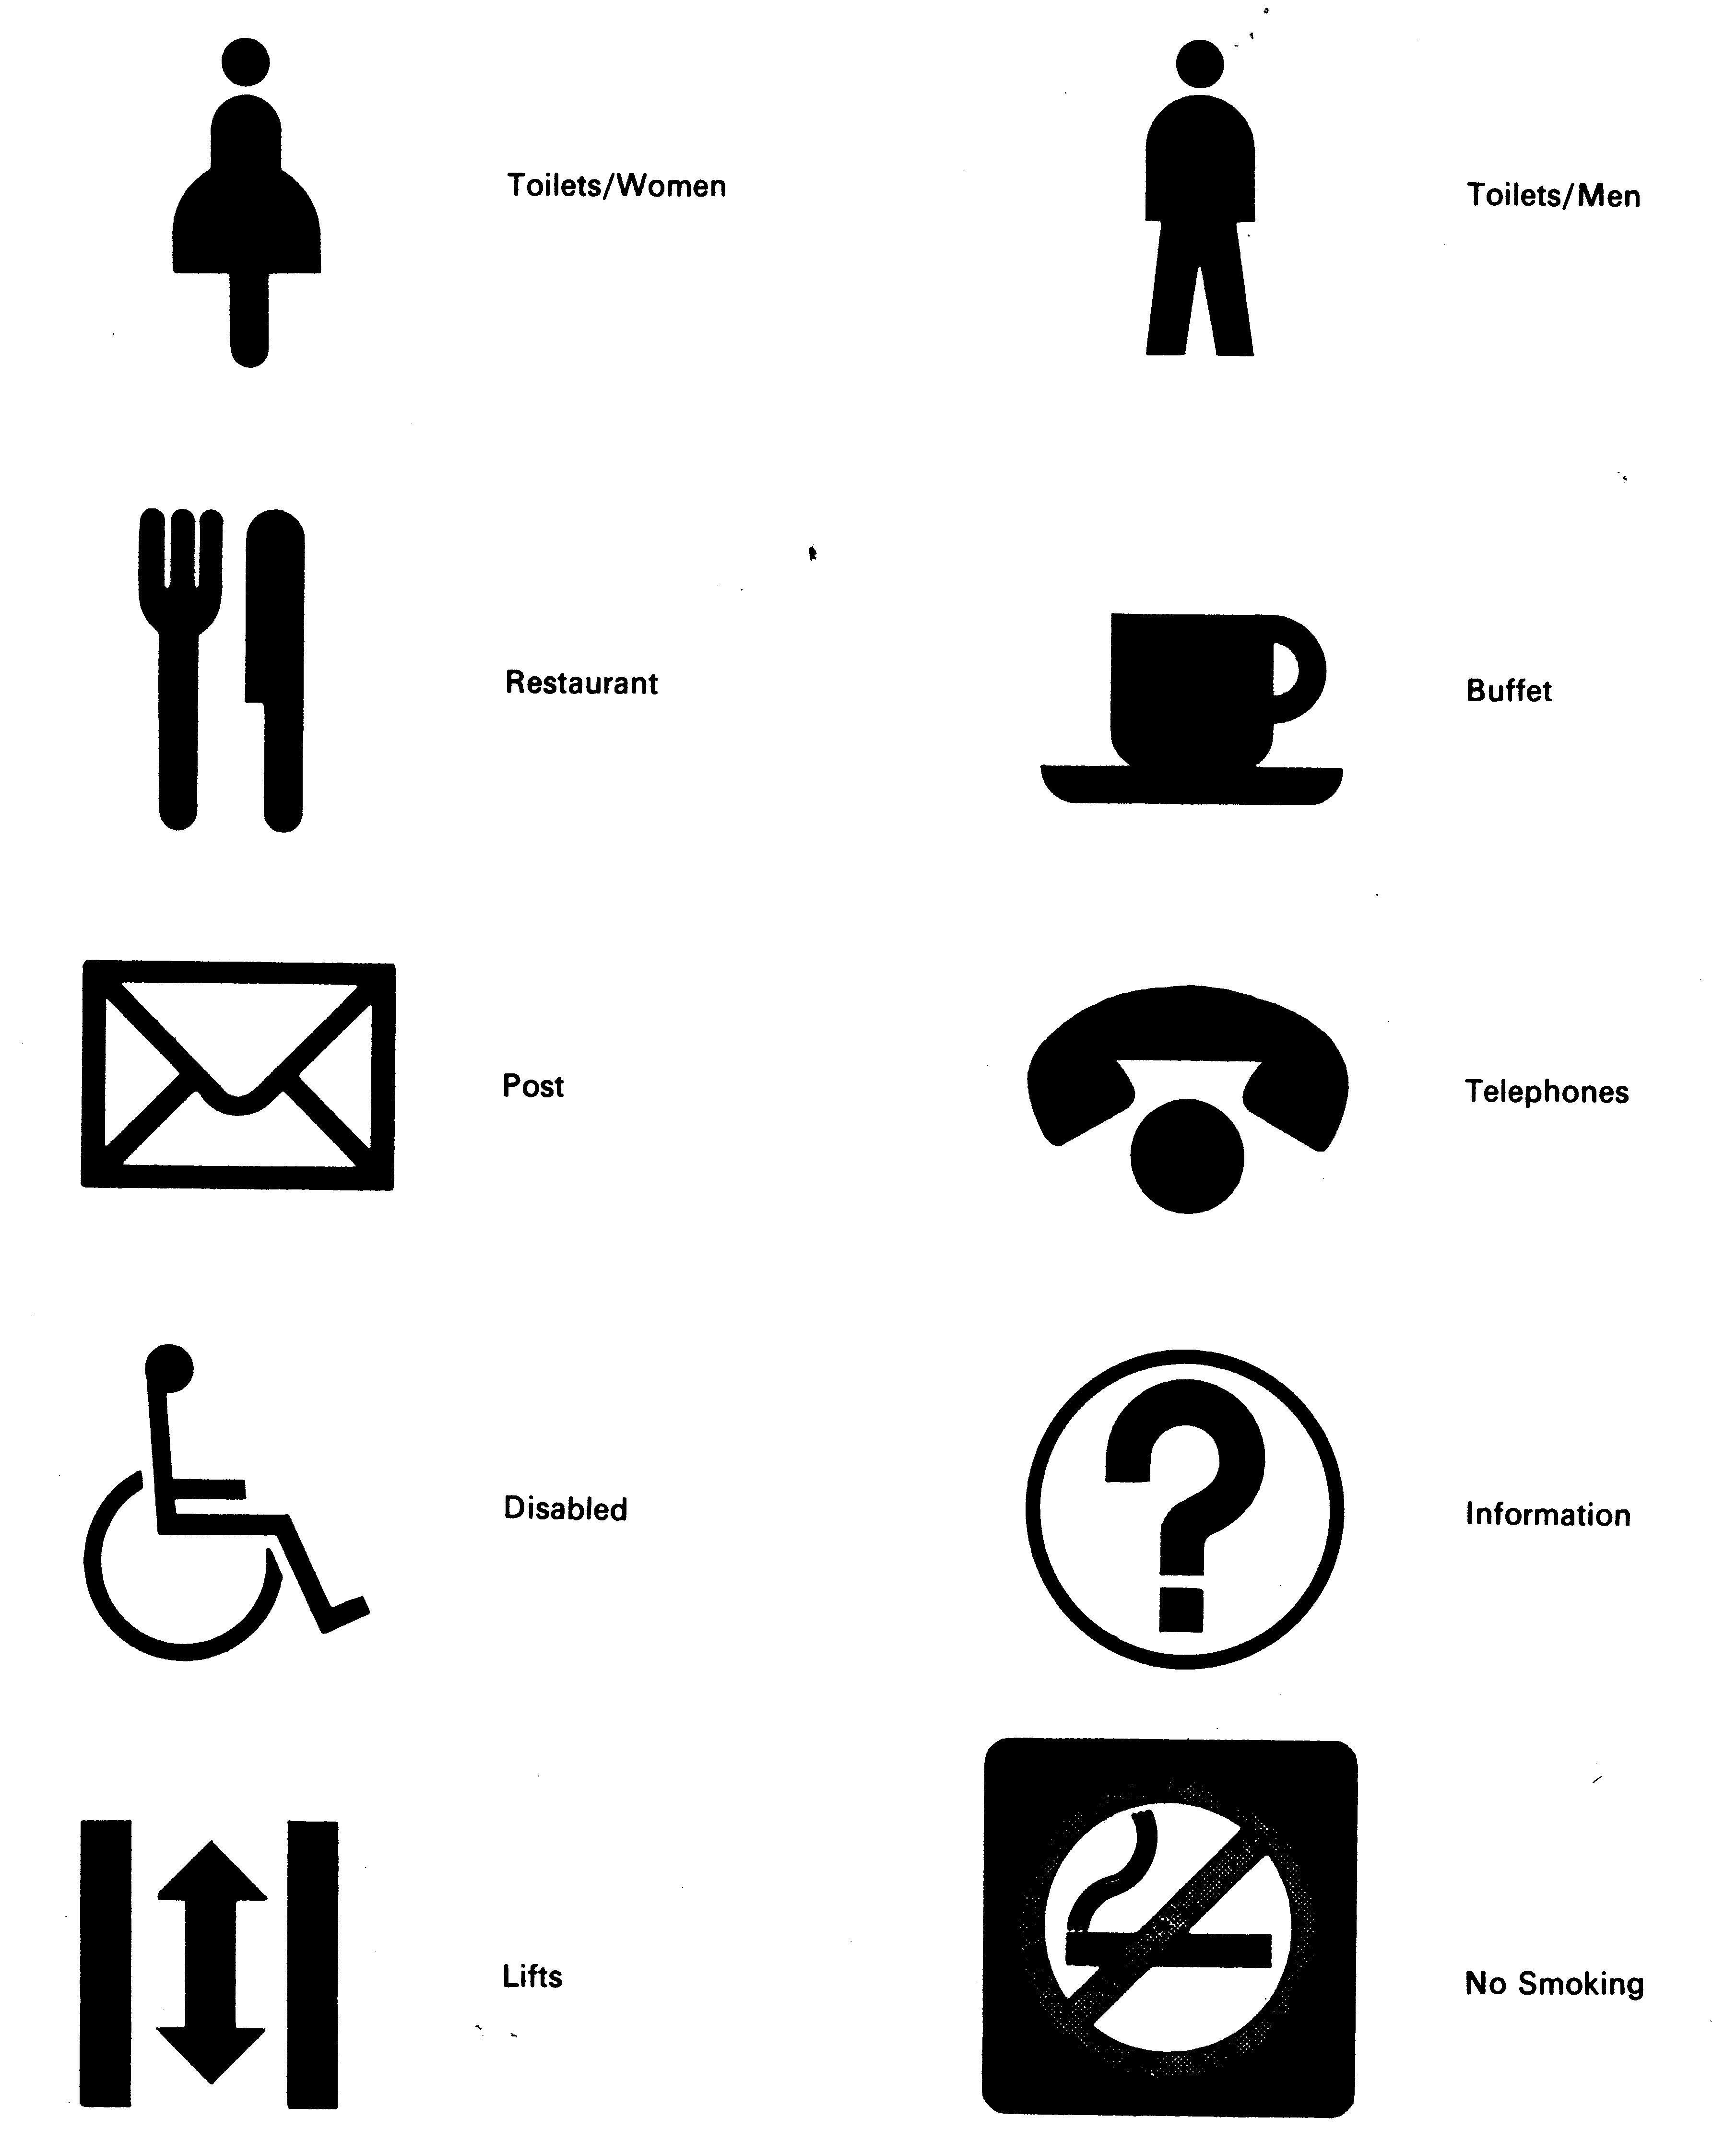 Building Symbols